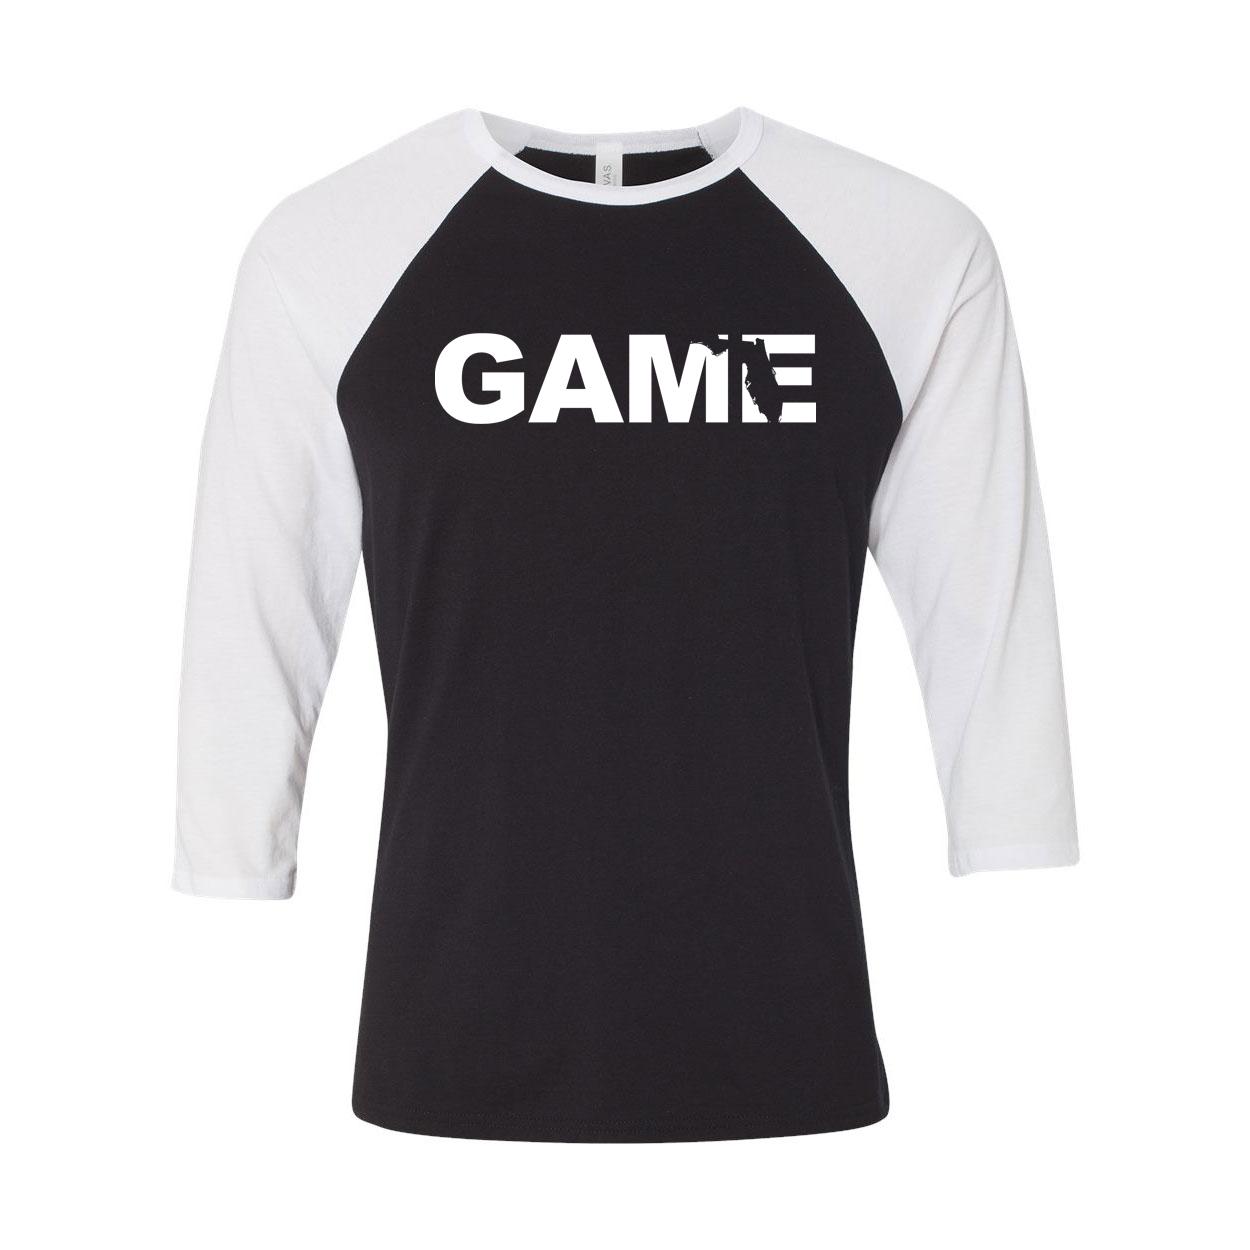 Game Florida Classic Raglan Shirt Black/White (White Logo)